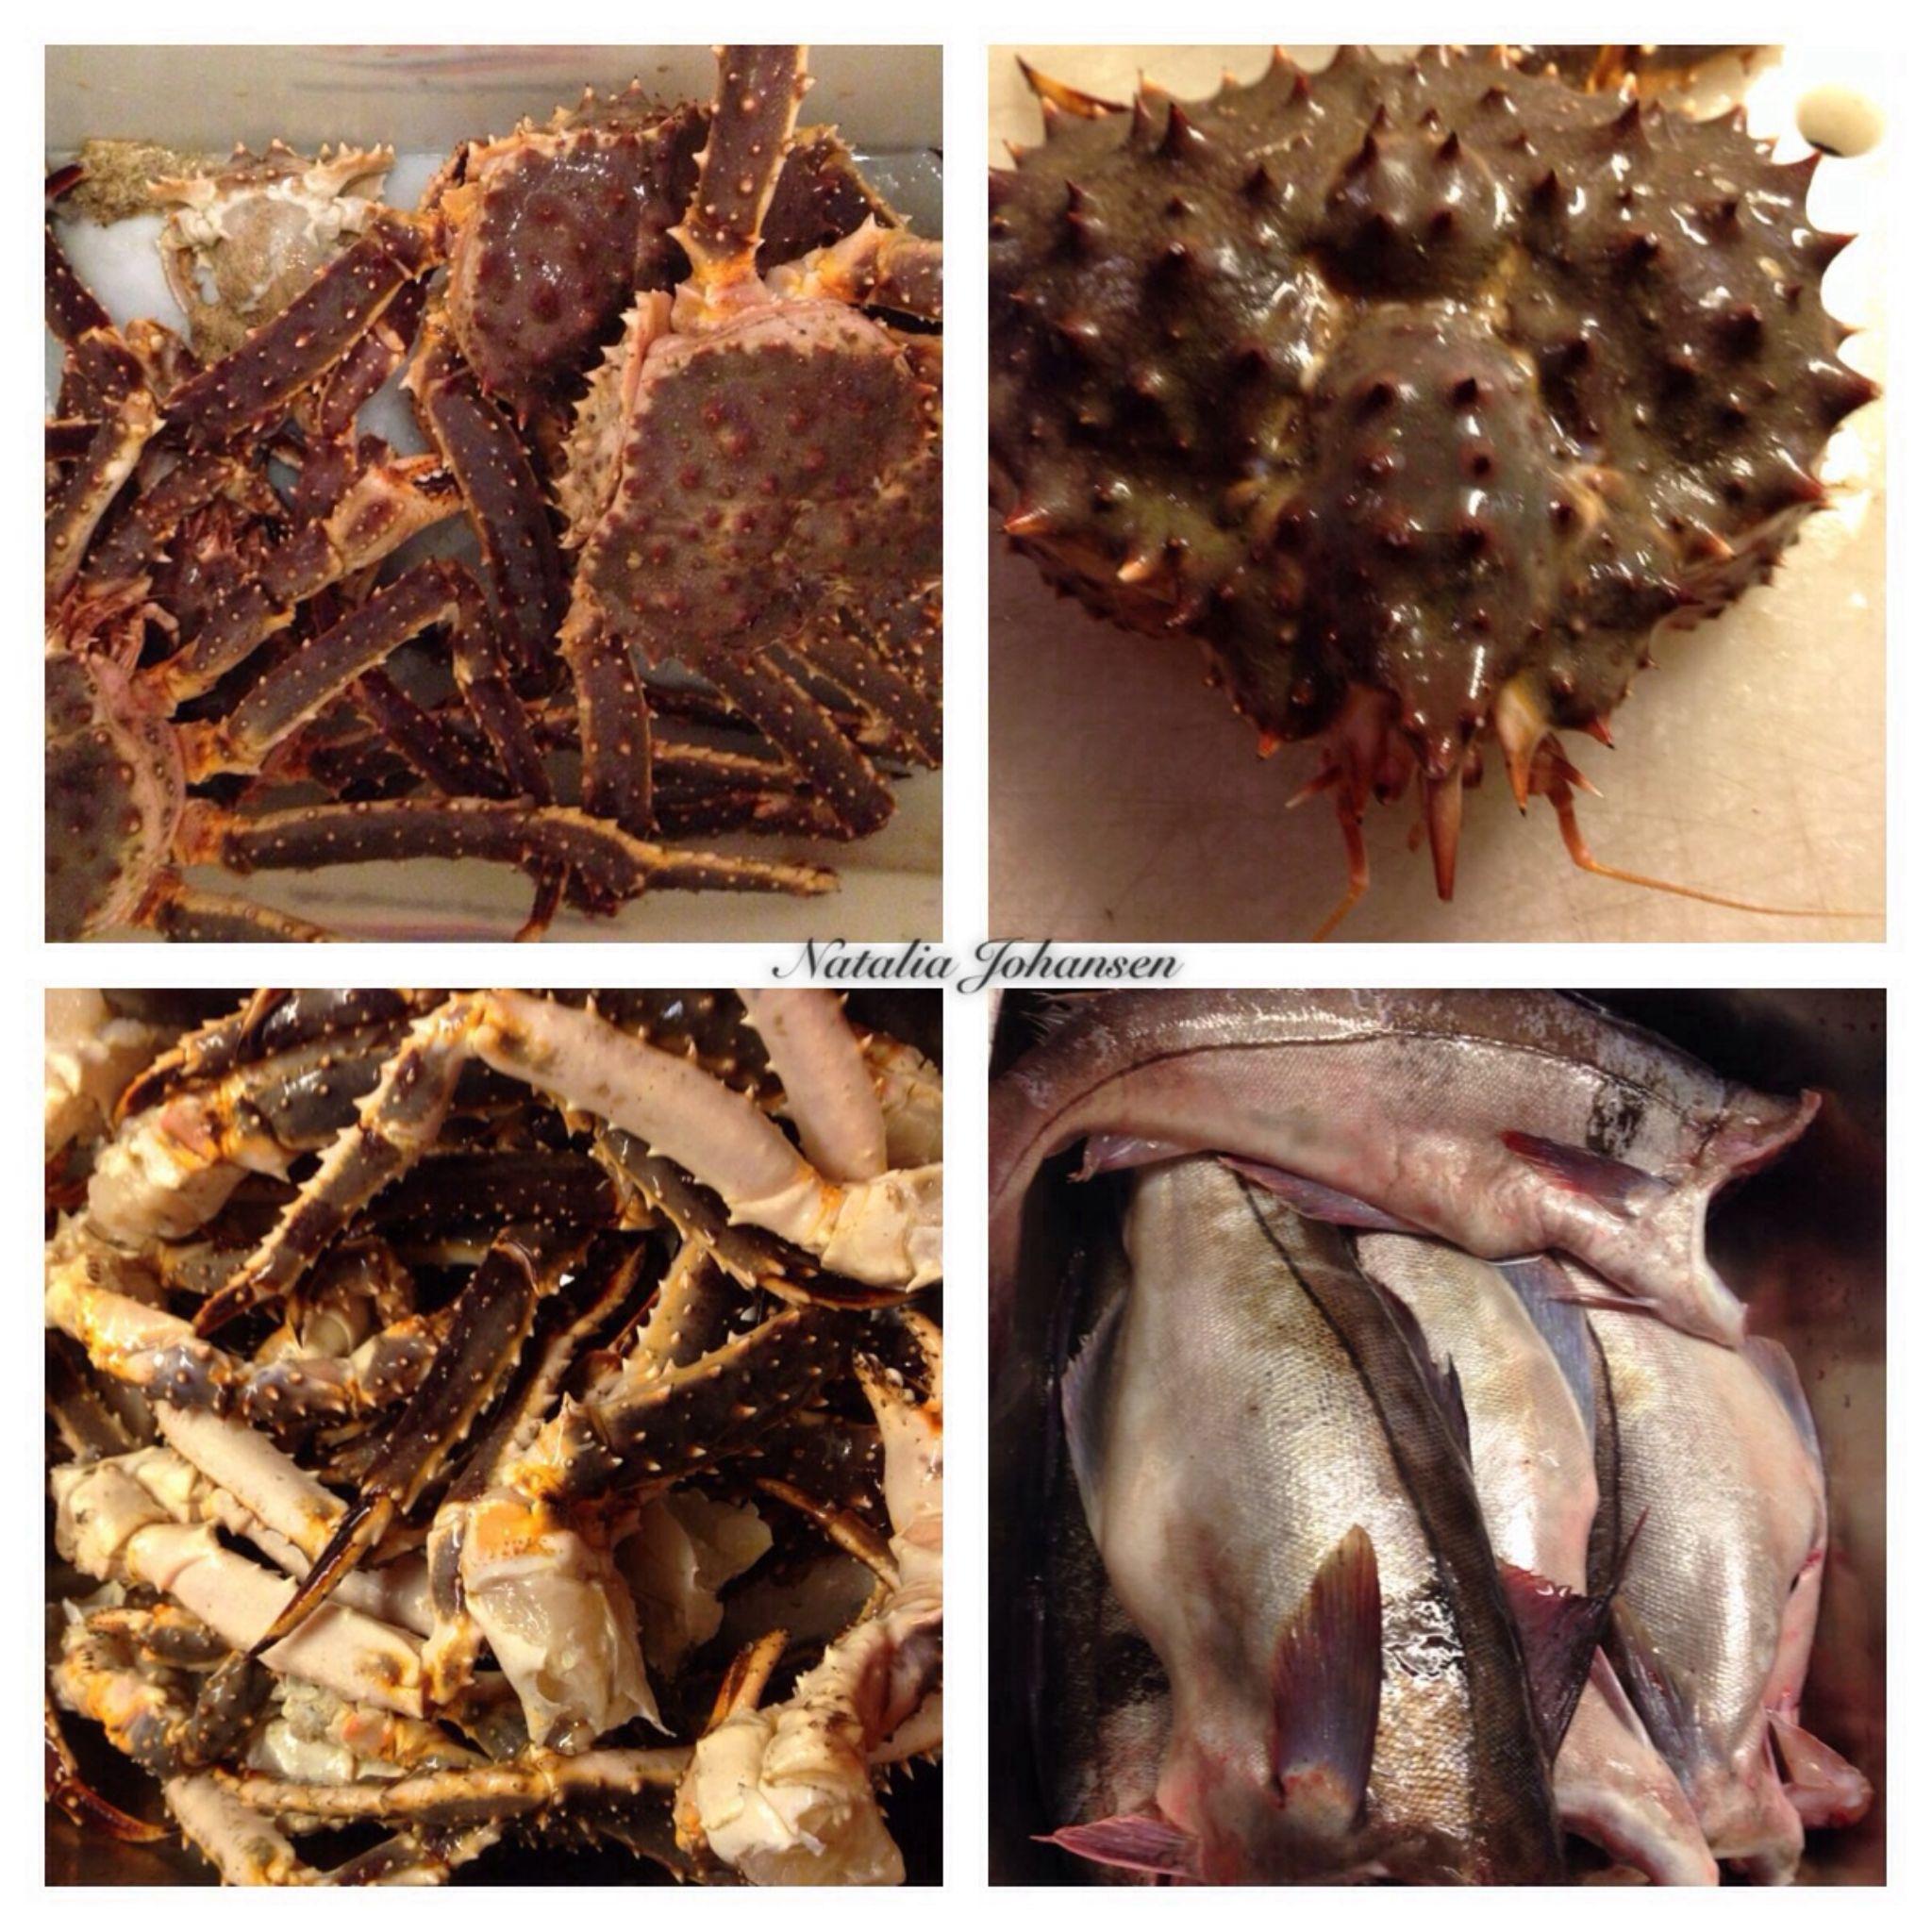 Crab and fish by natalia.johansen.92